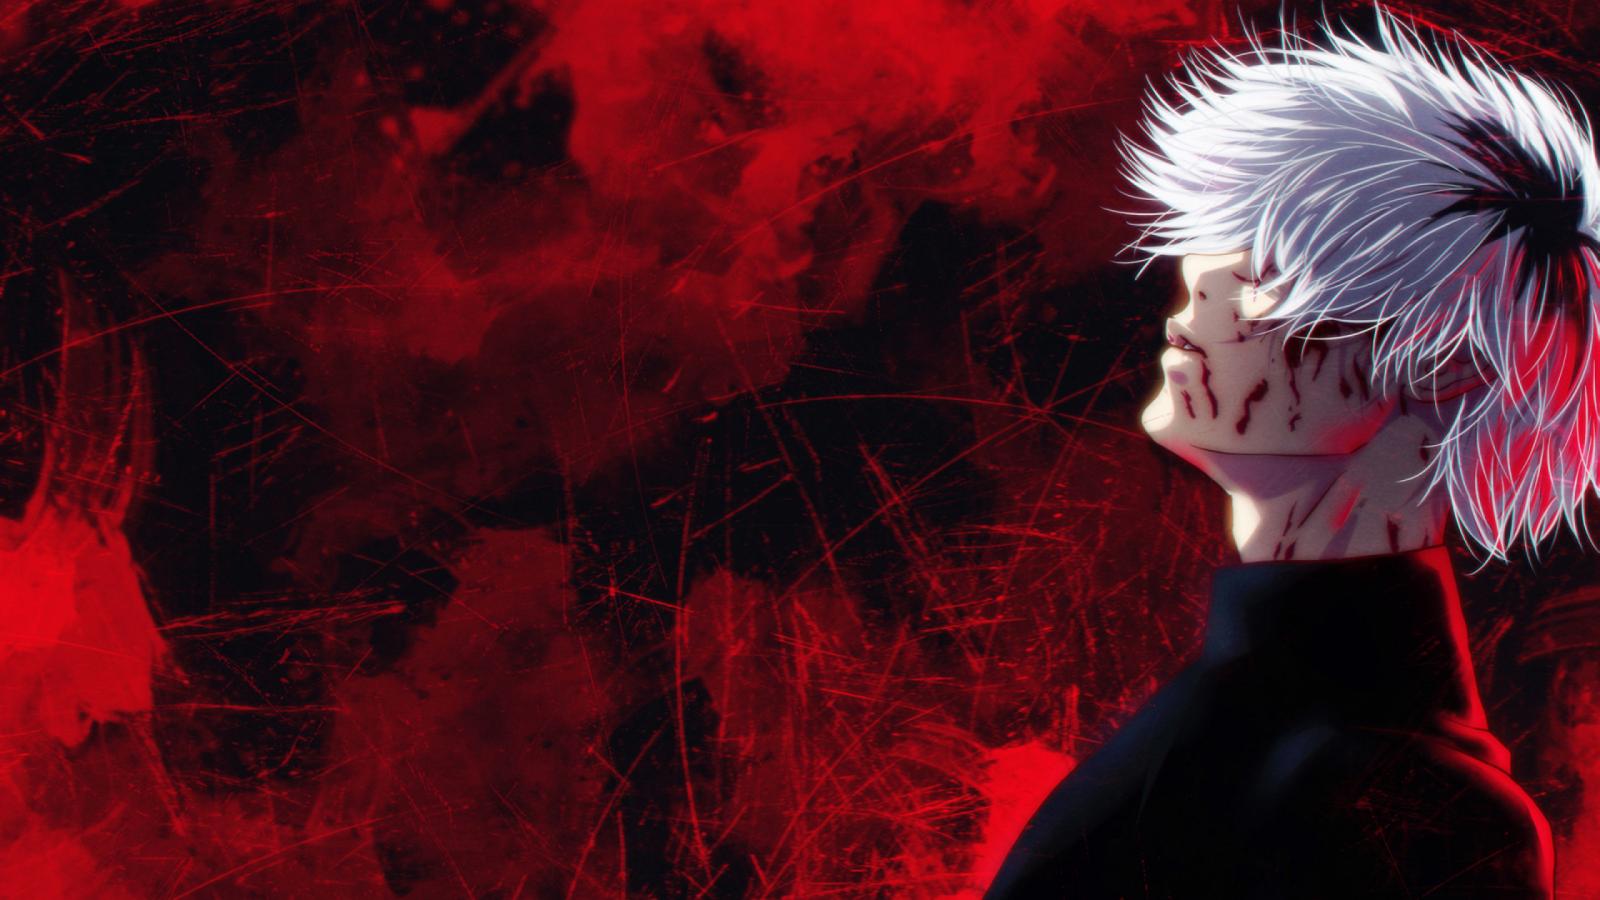 Wallpaper Anime Ken Kaneki Red Tokyo Ghoul White Hair 2560x1440 Rodriguez Jorge 1636061 Hd Wallpapers Wallhere